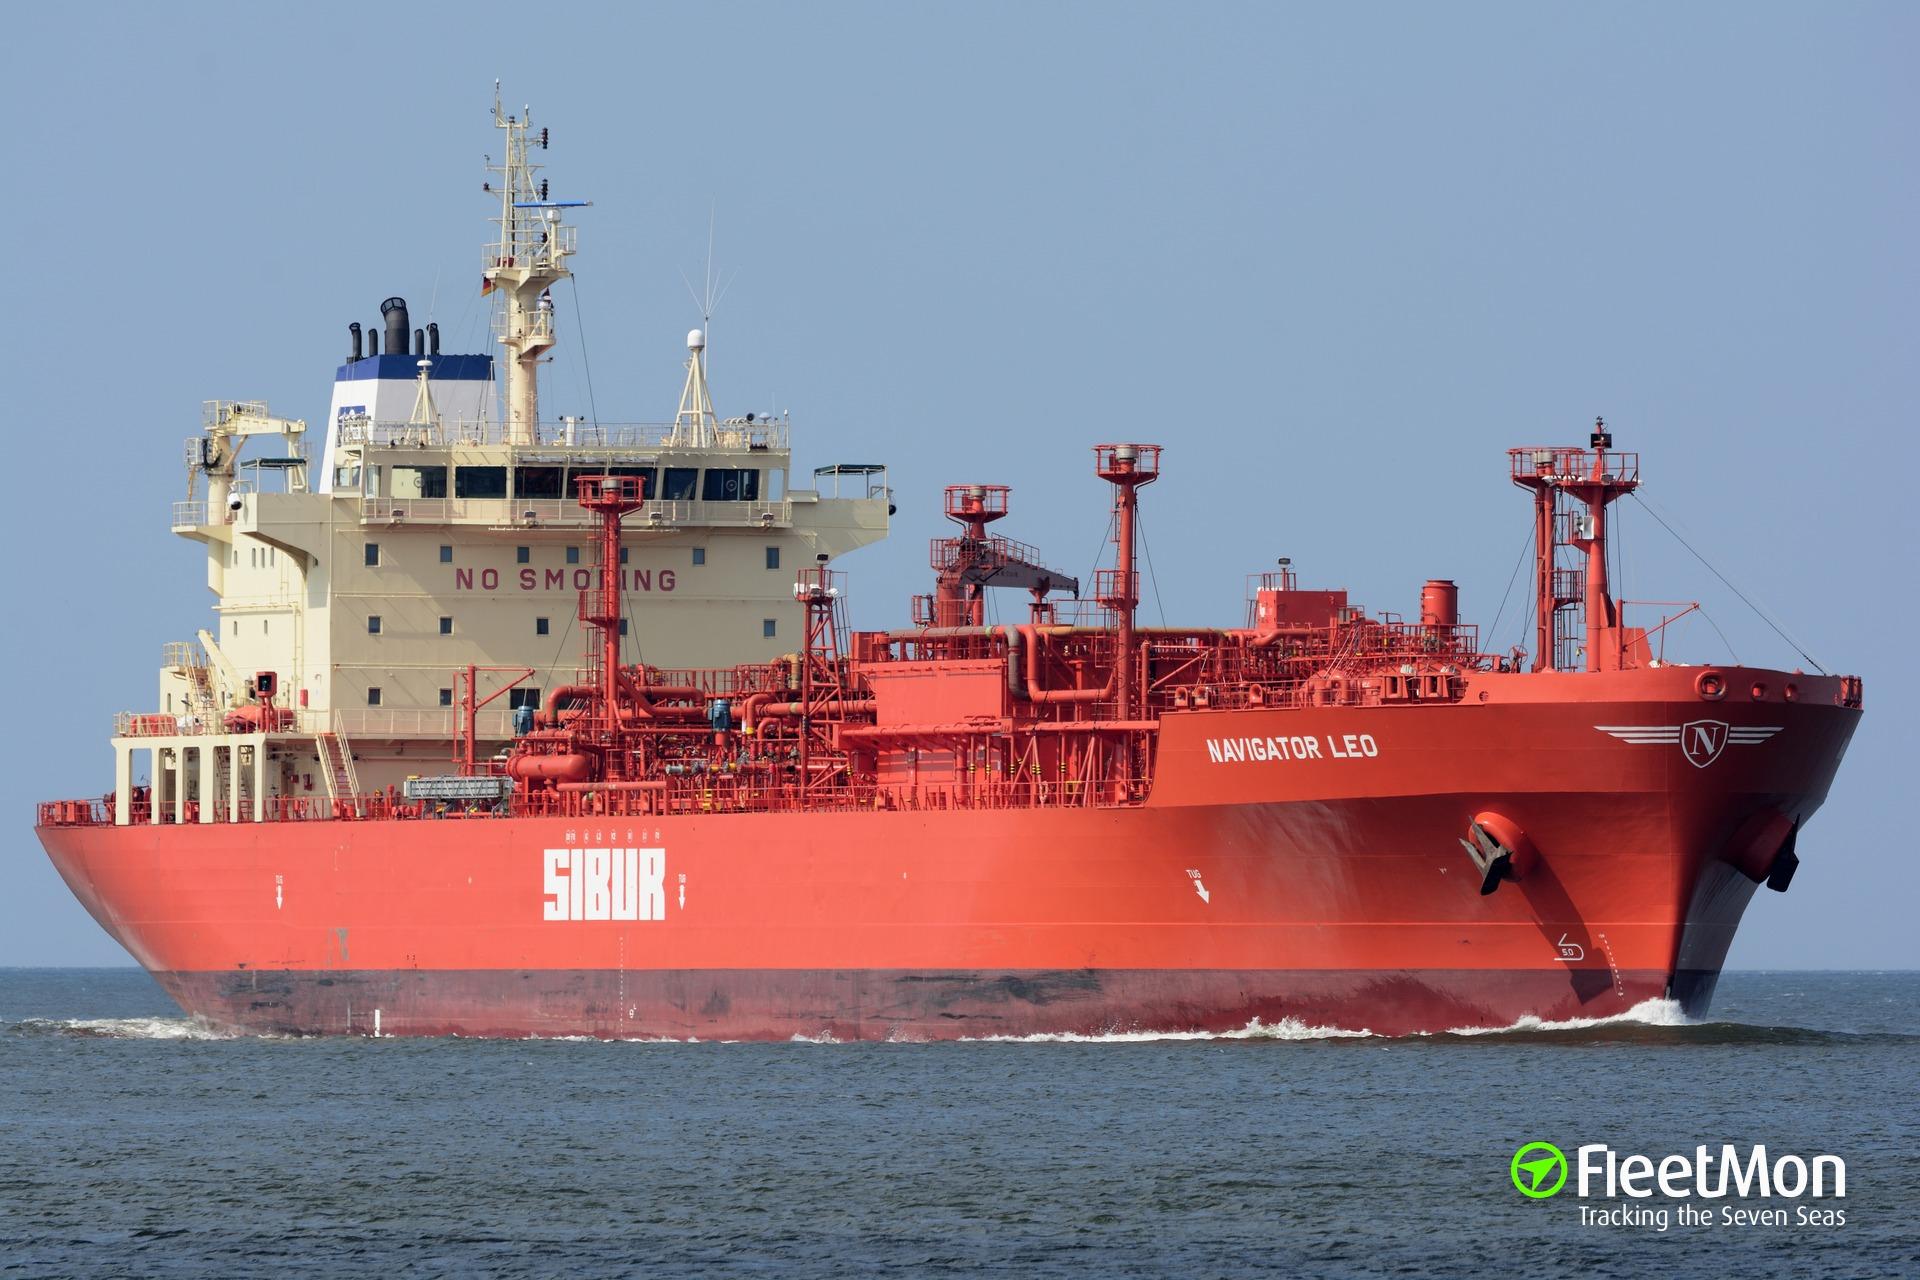 LPG tanker NAVIGATOR LEO fire, Gulf of Finland